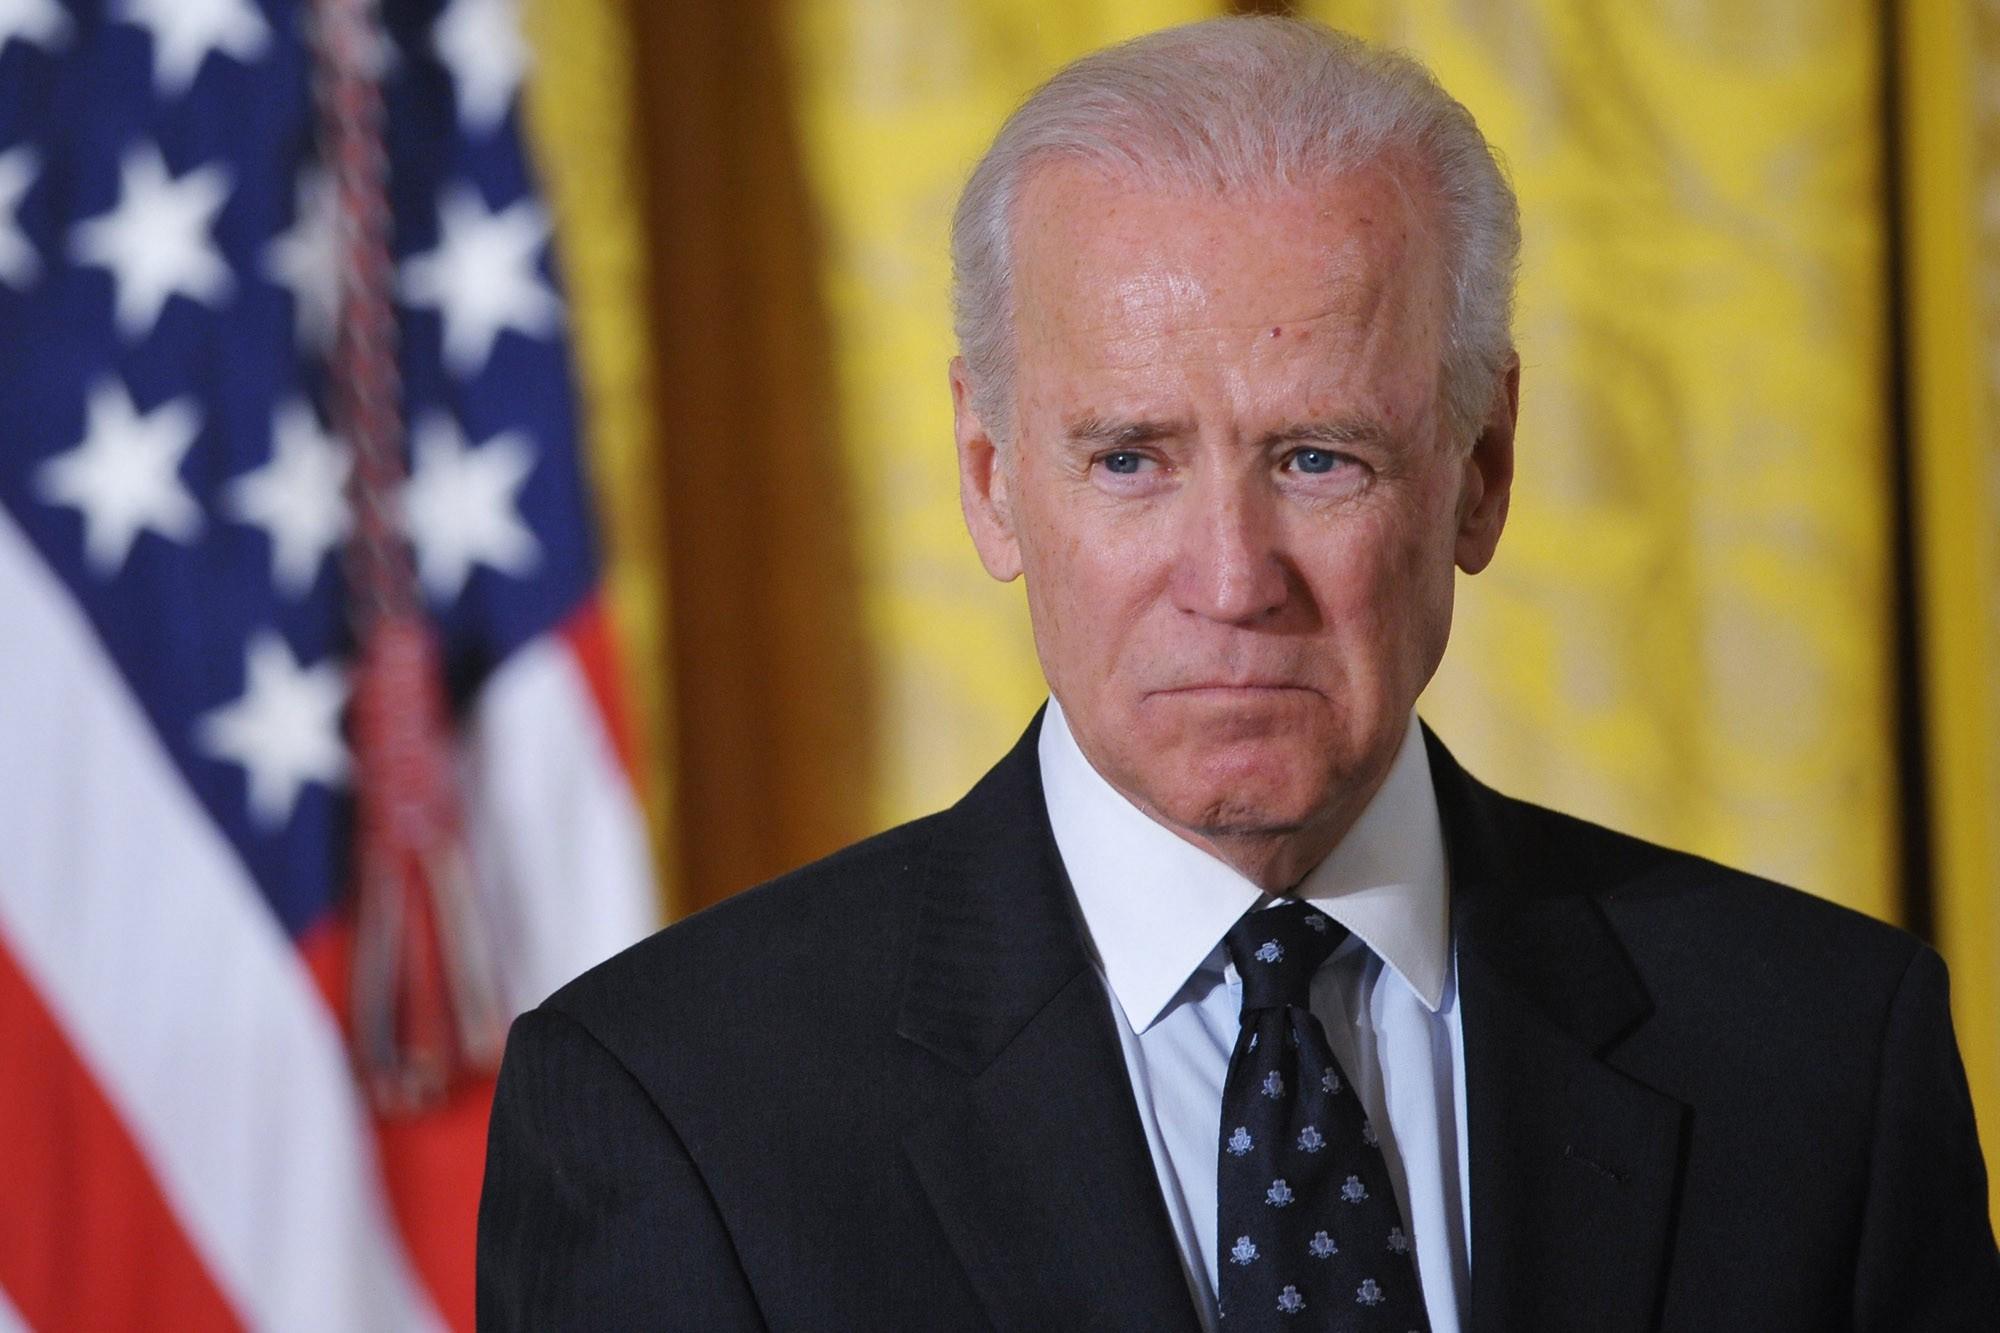 Biden and big tech